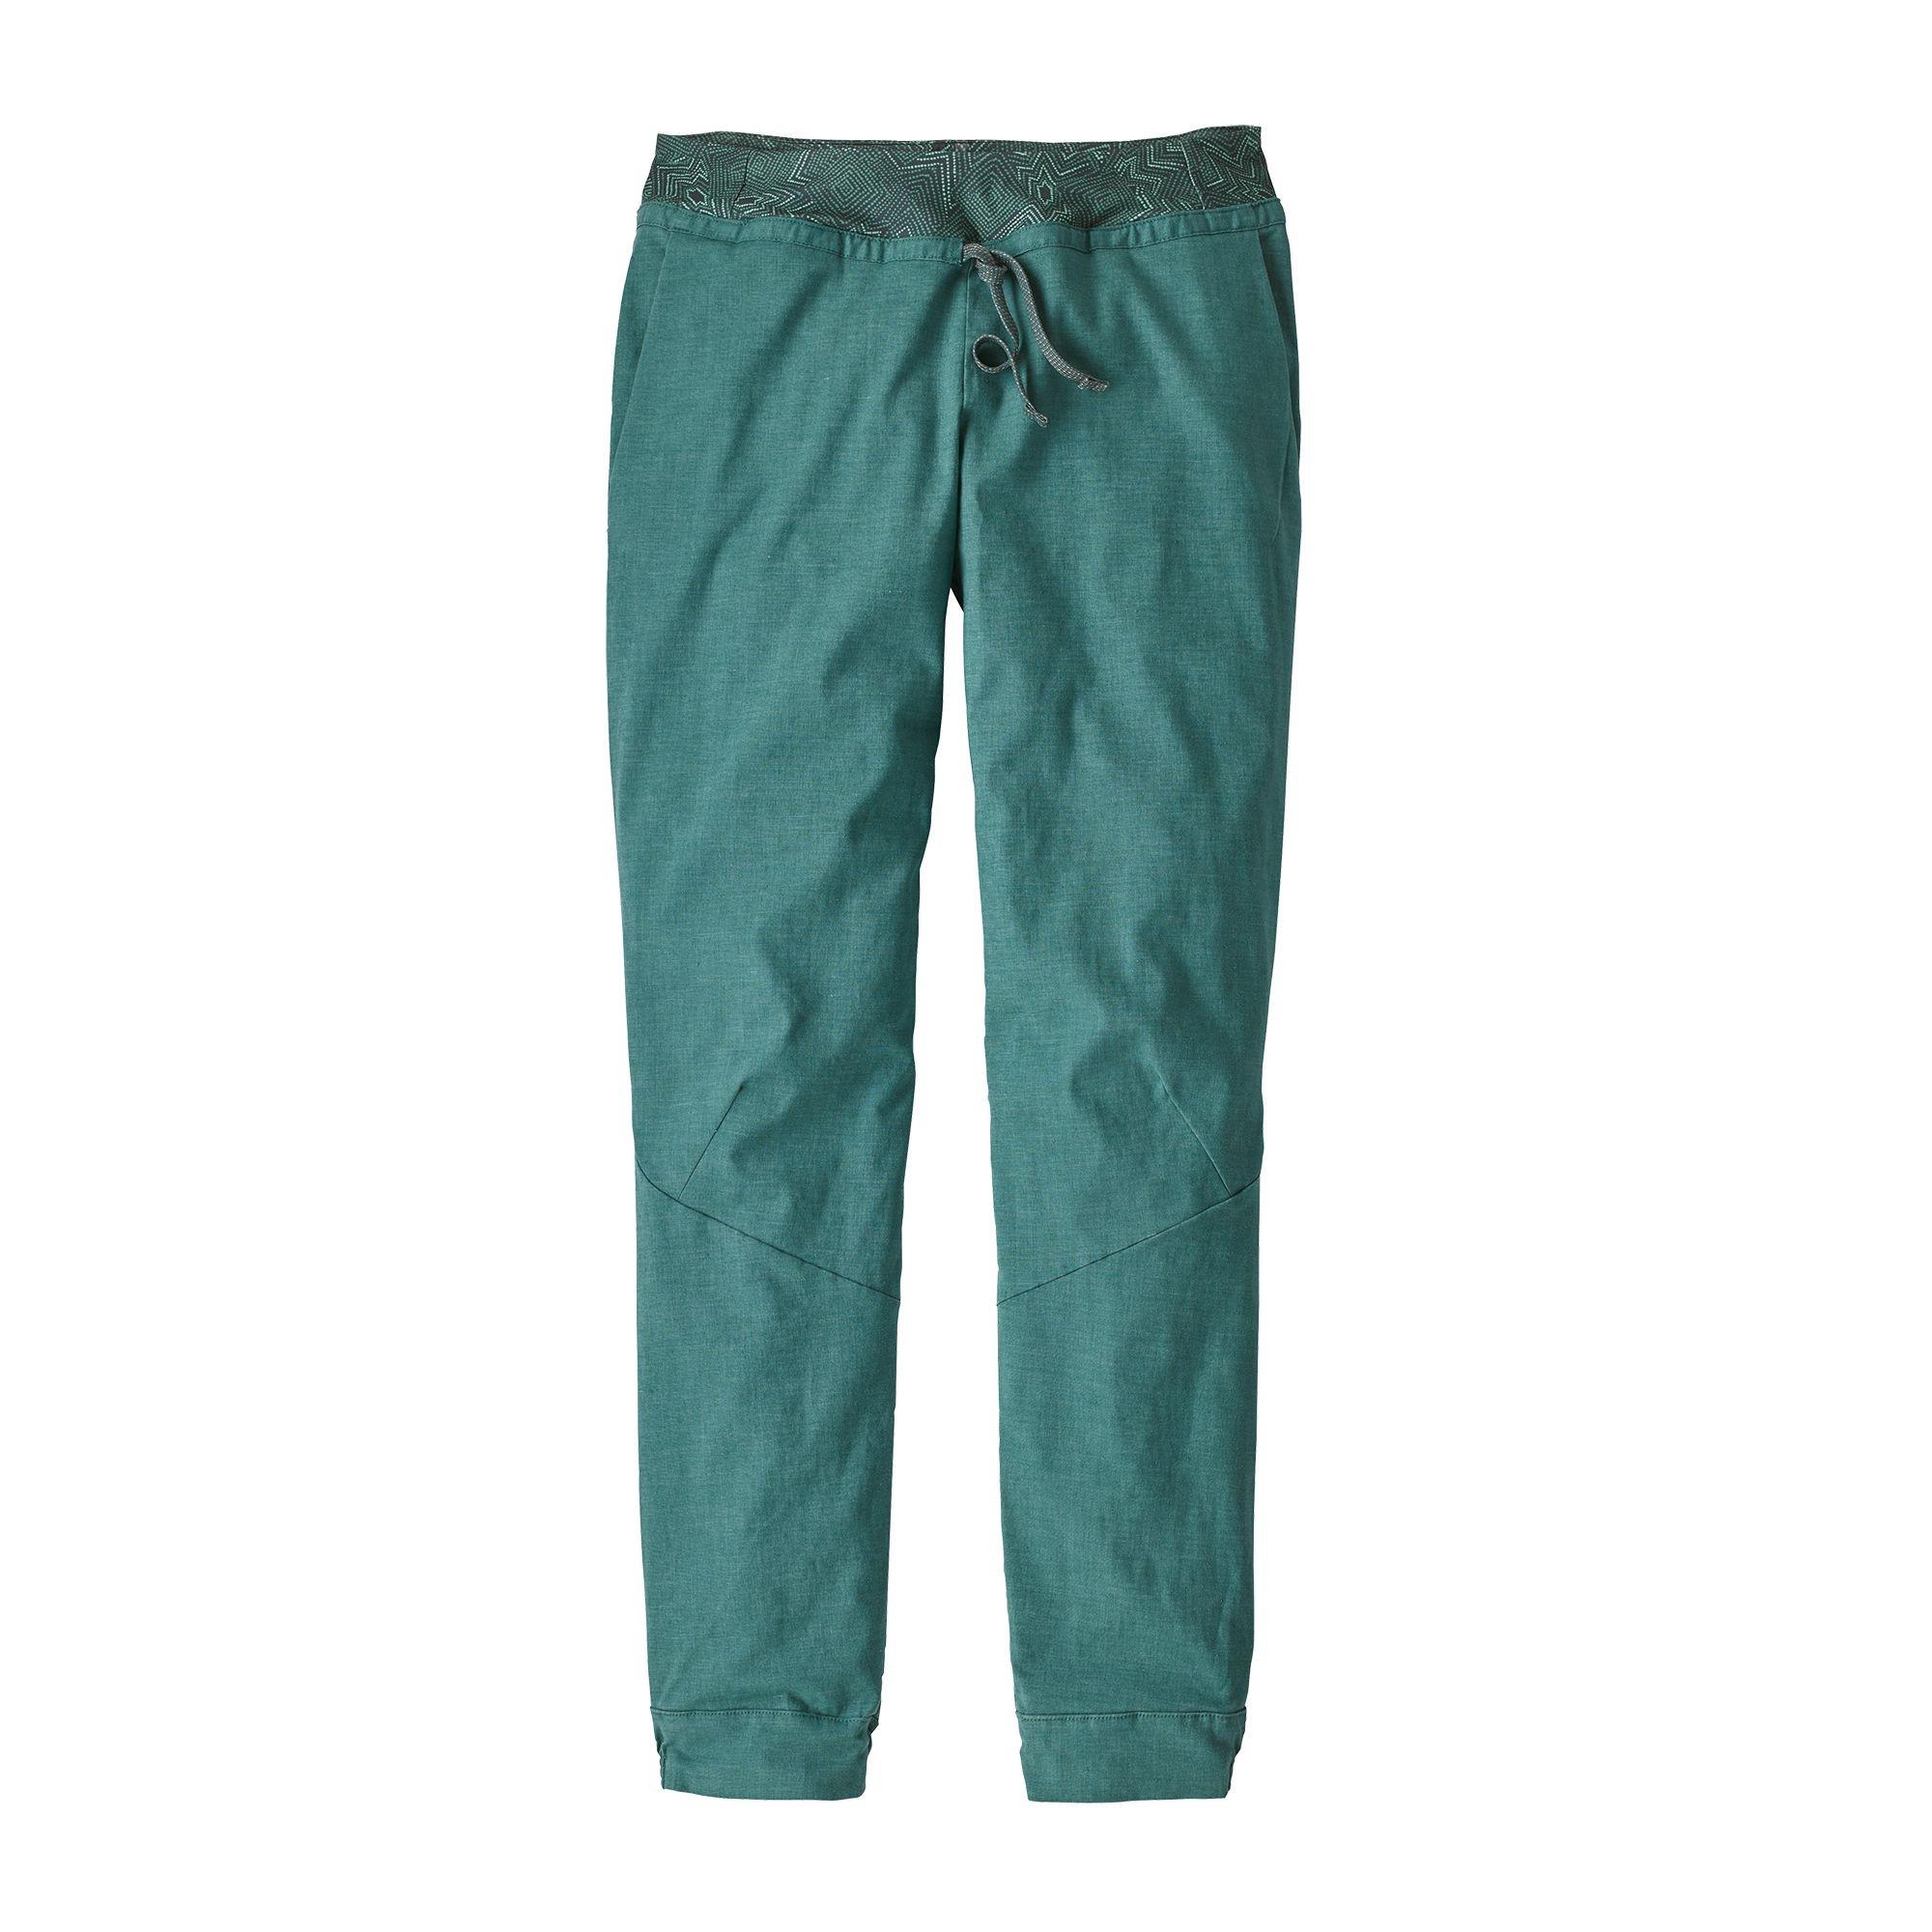 Spodnie Hampi Rock tasmanian teal